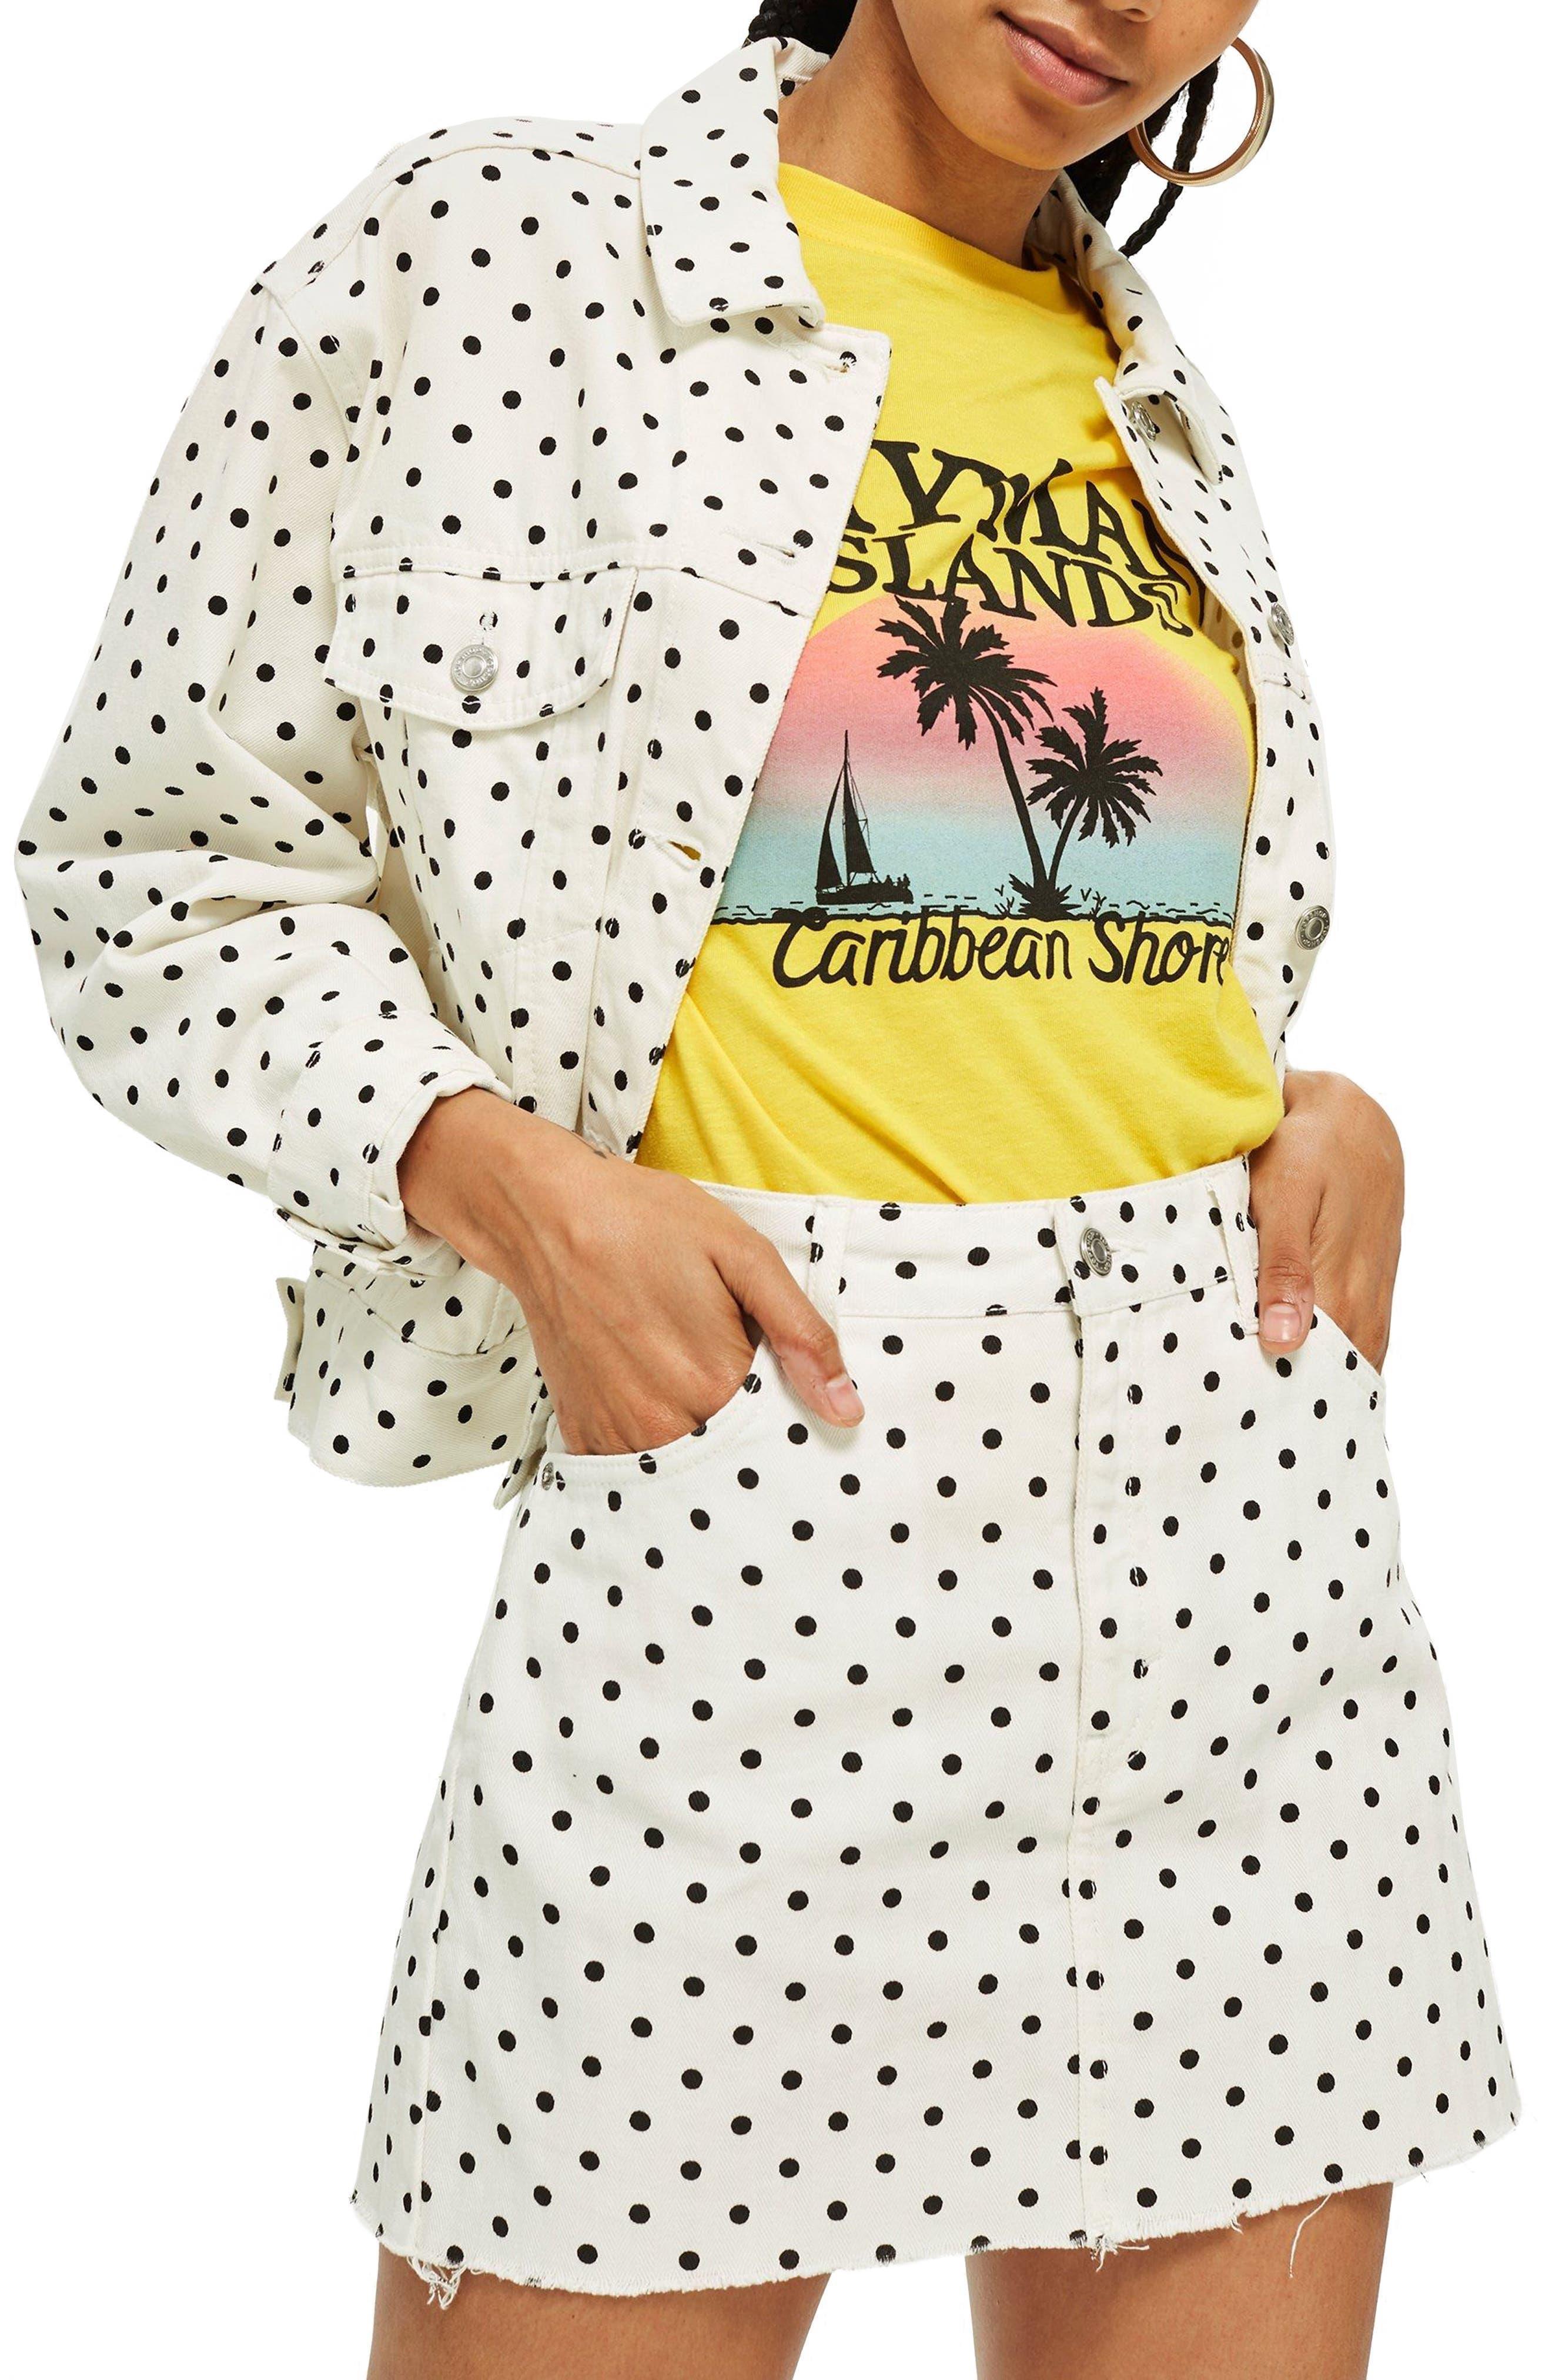 MOTO Polka Dot Crop Nonstretch Denim Jacket,                         Main,                         color, White Multi